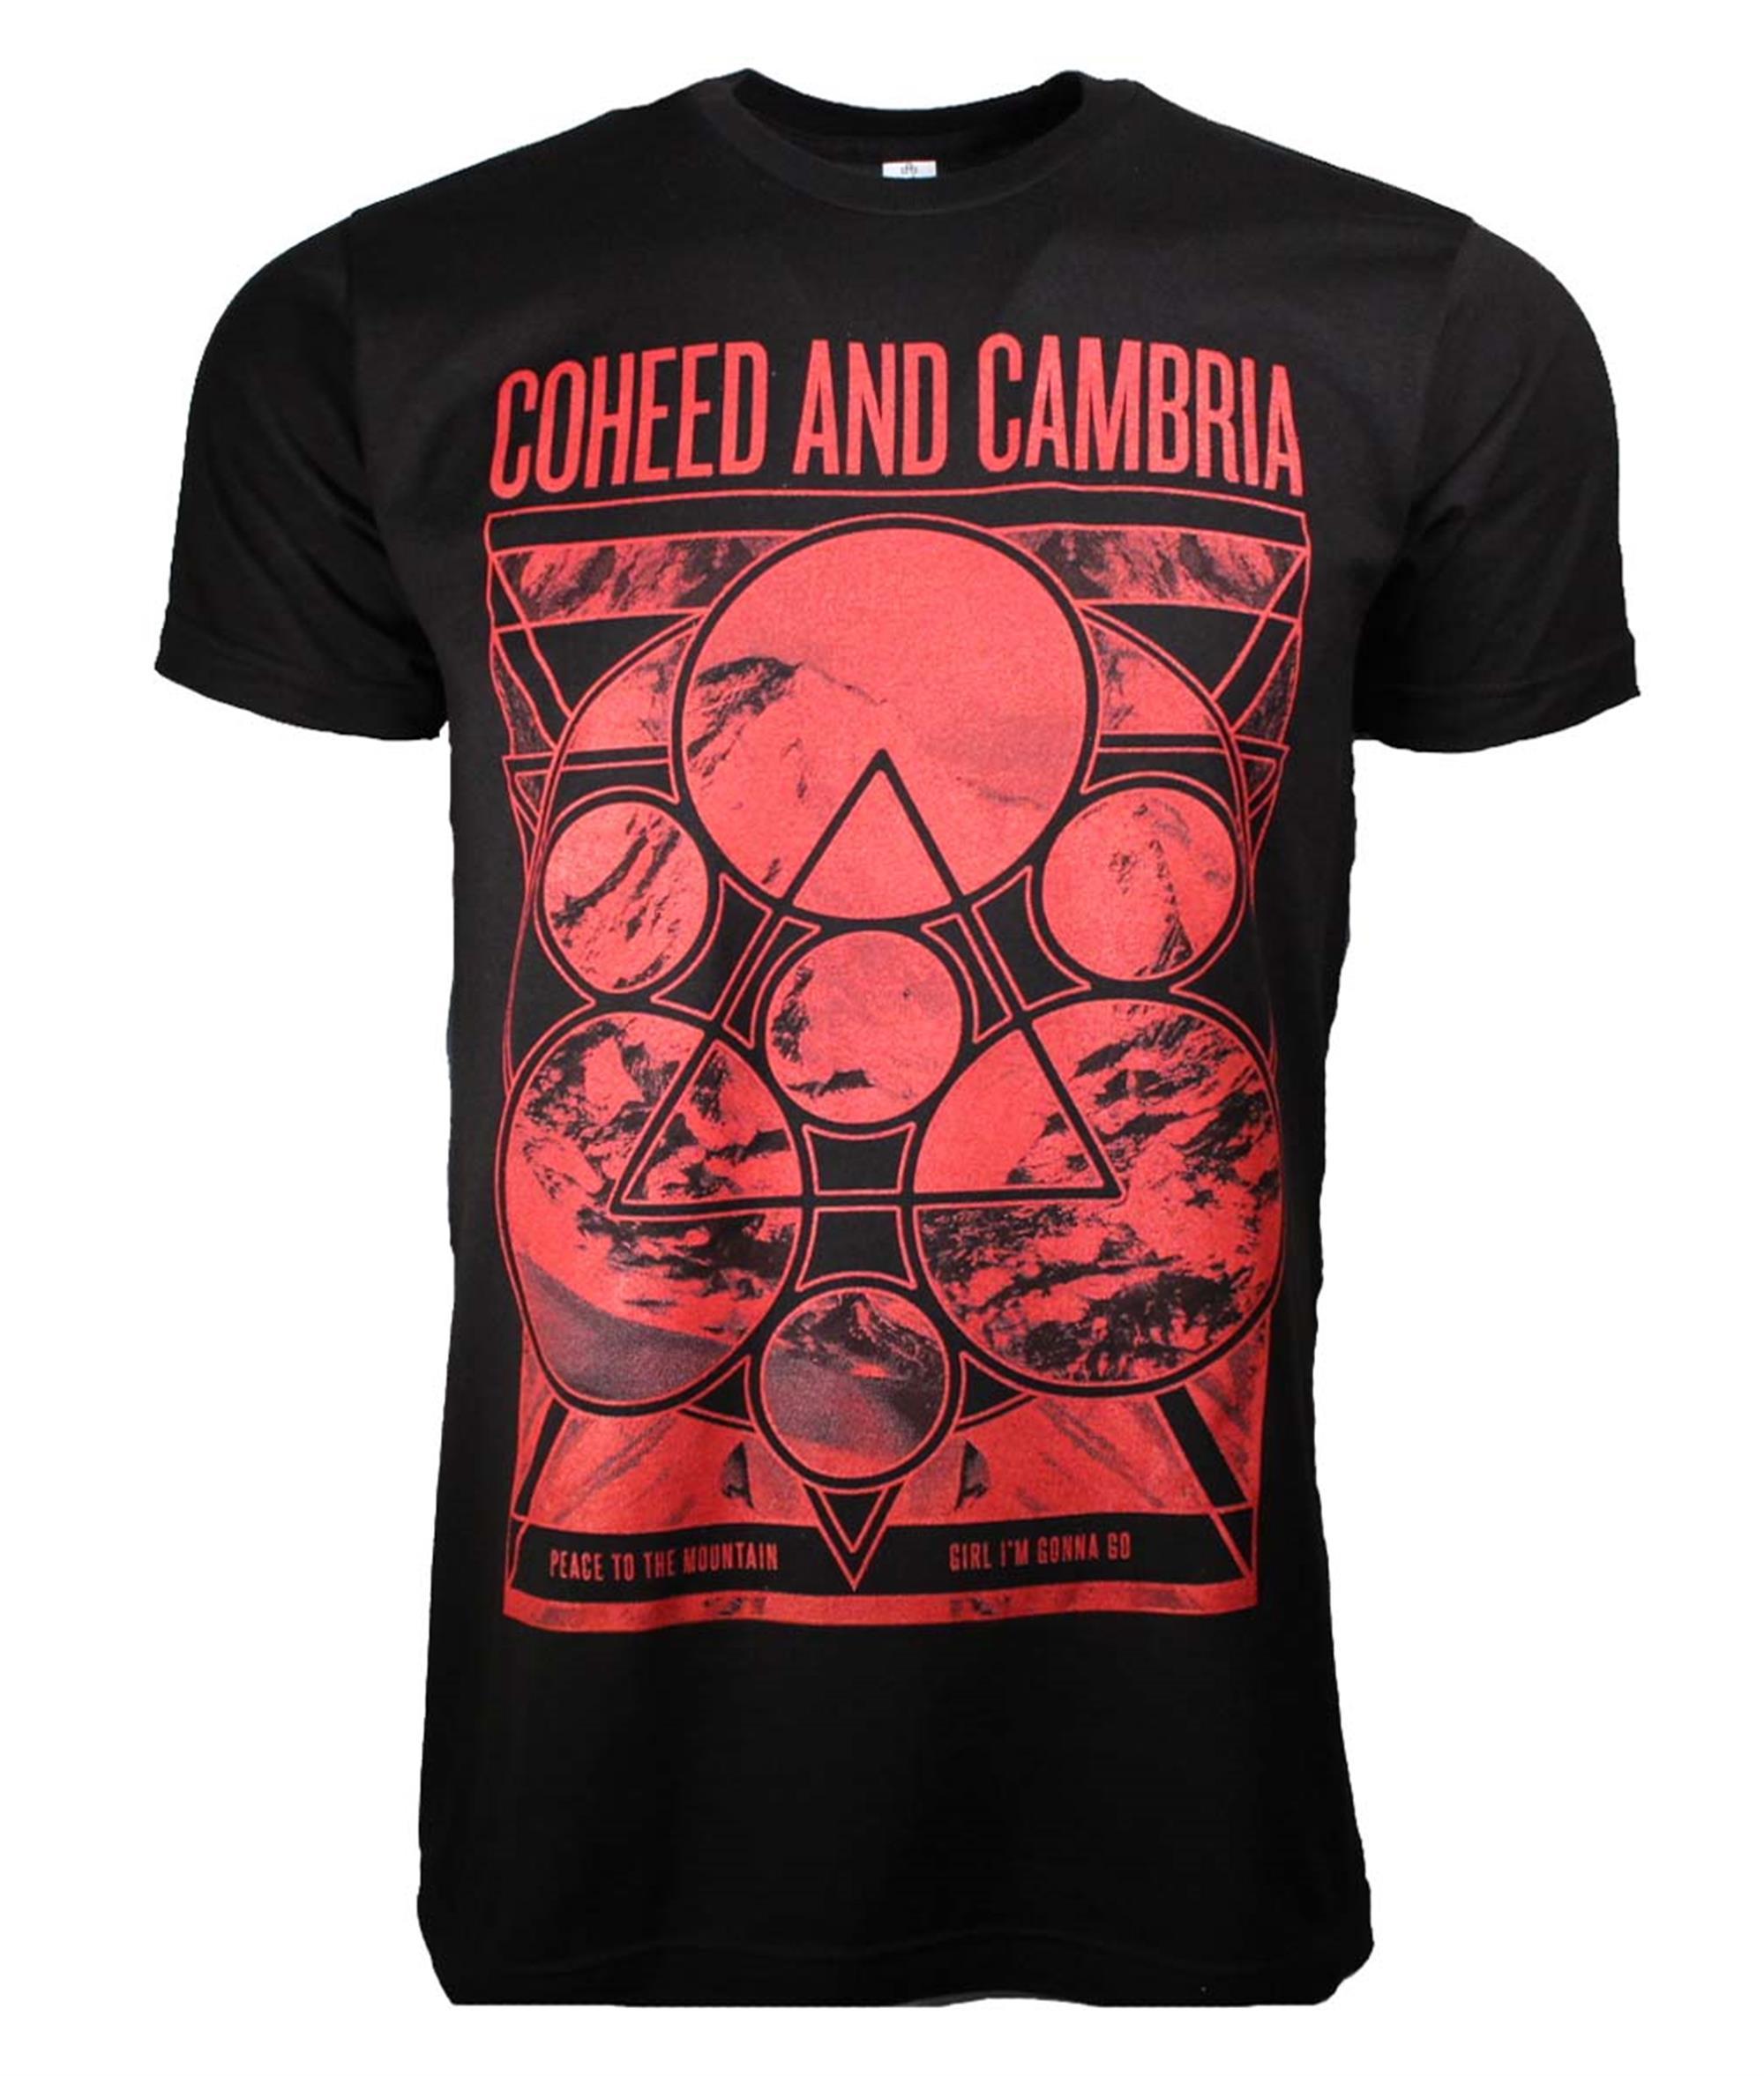 Coheed and Cambria Mountain Peace T-Shirt